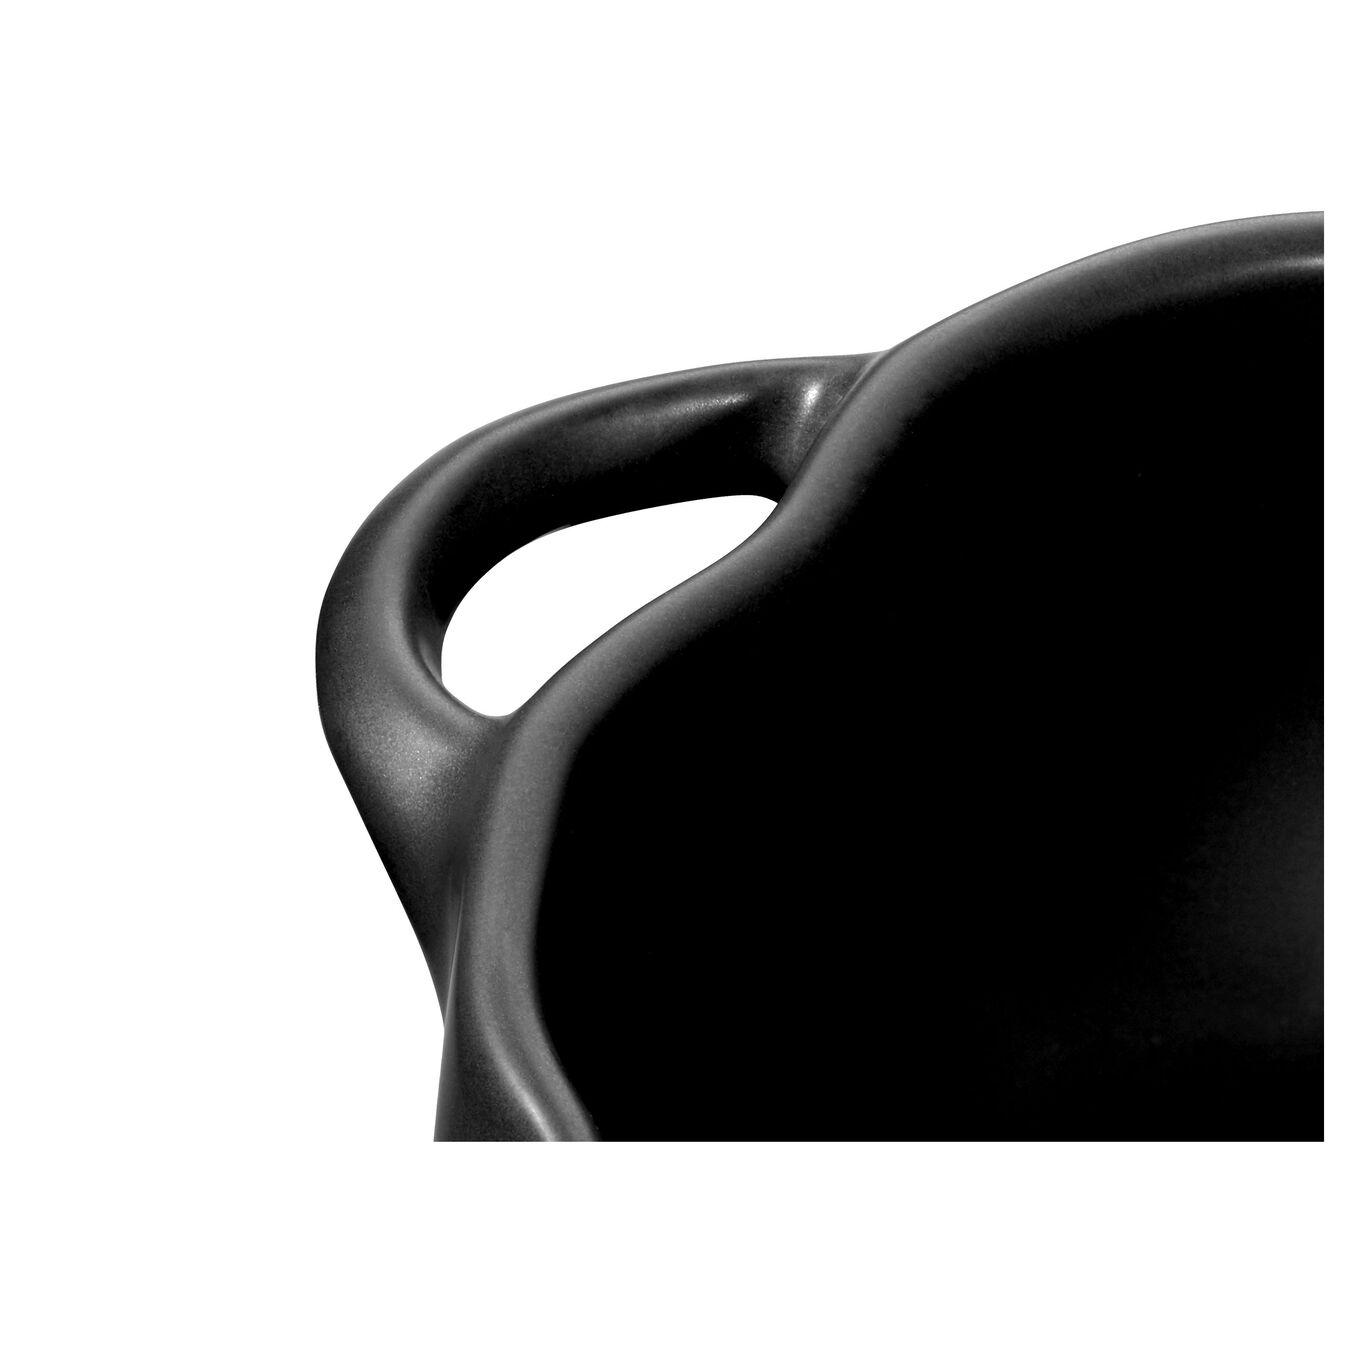 Cocotte 15 cm, Kürbis, Schwarz, Keramik,,large 3